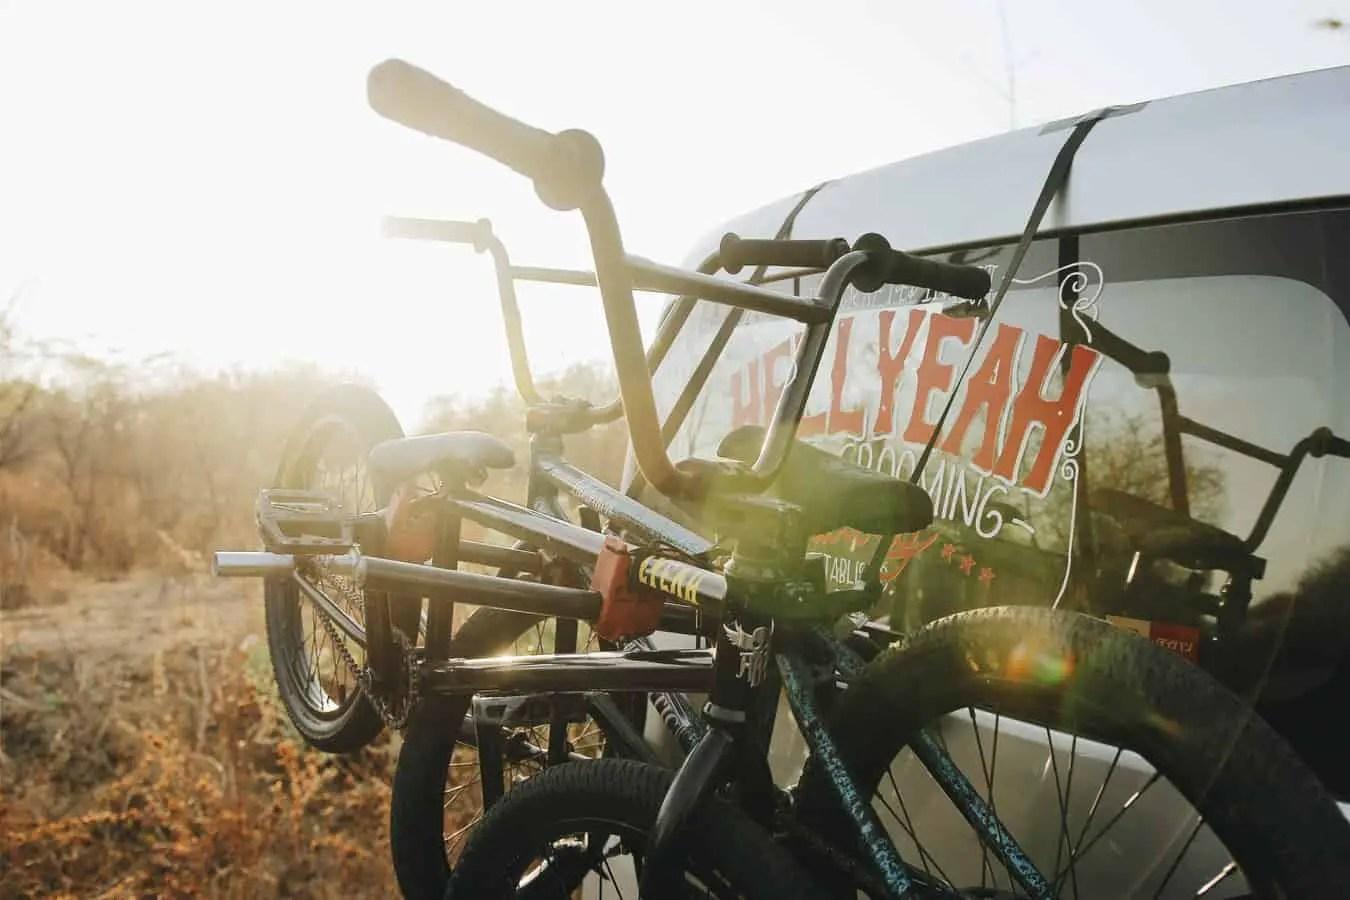 How To Put Grips on a BMX Bike